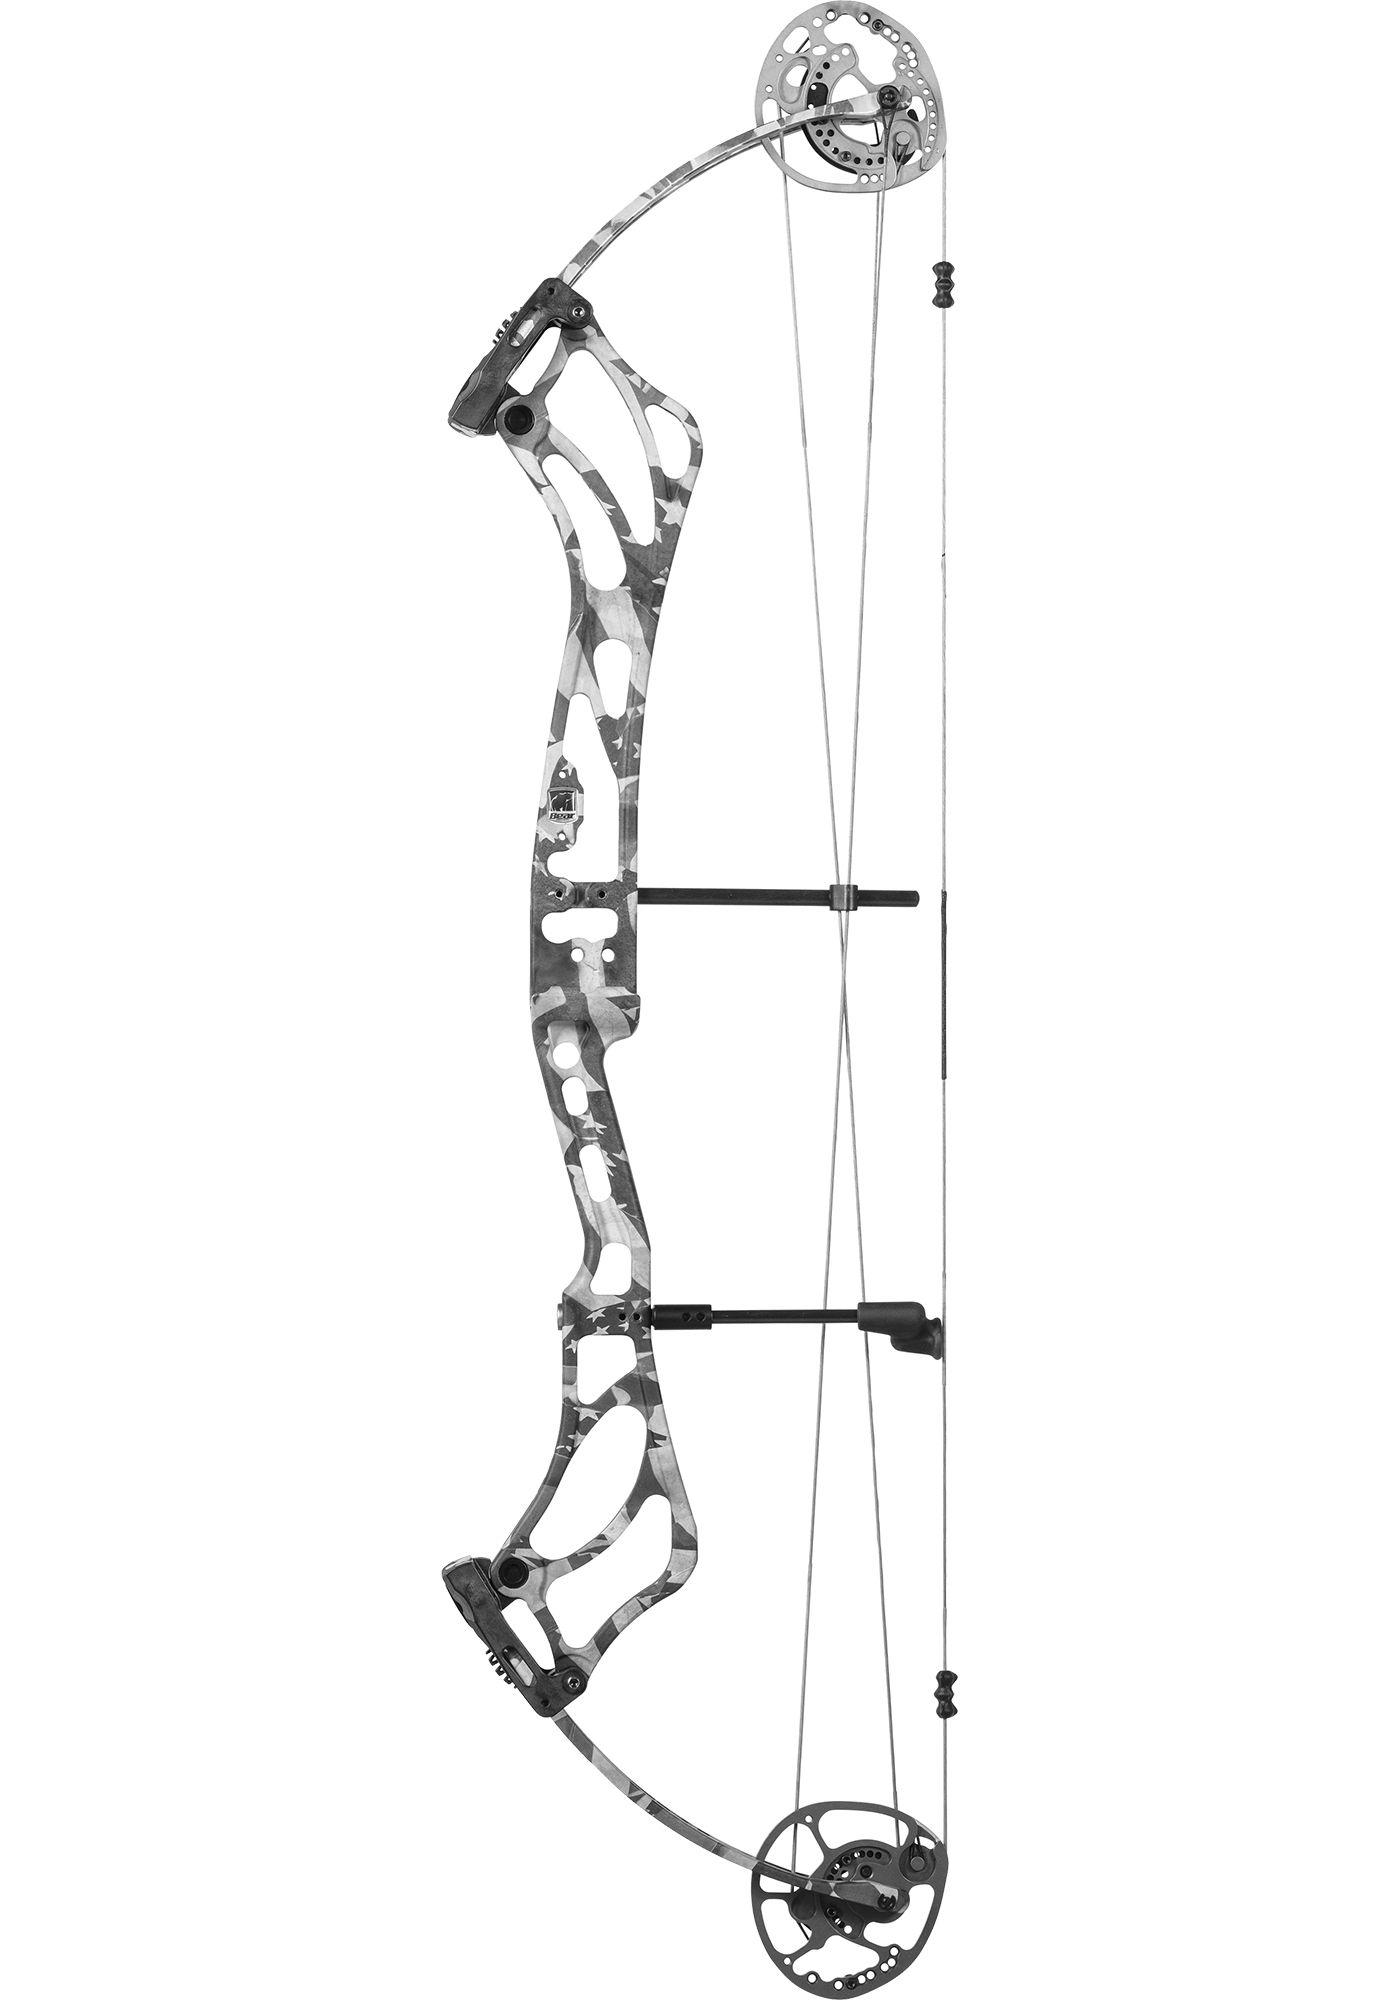 Bear Archery Revival Compound Bow